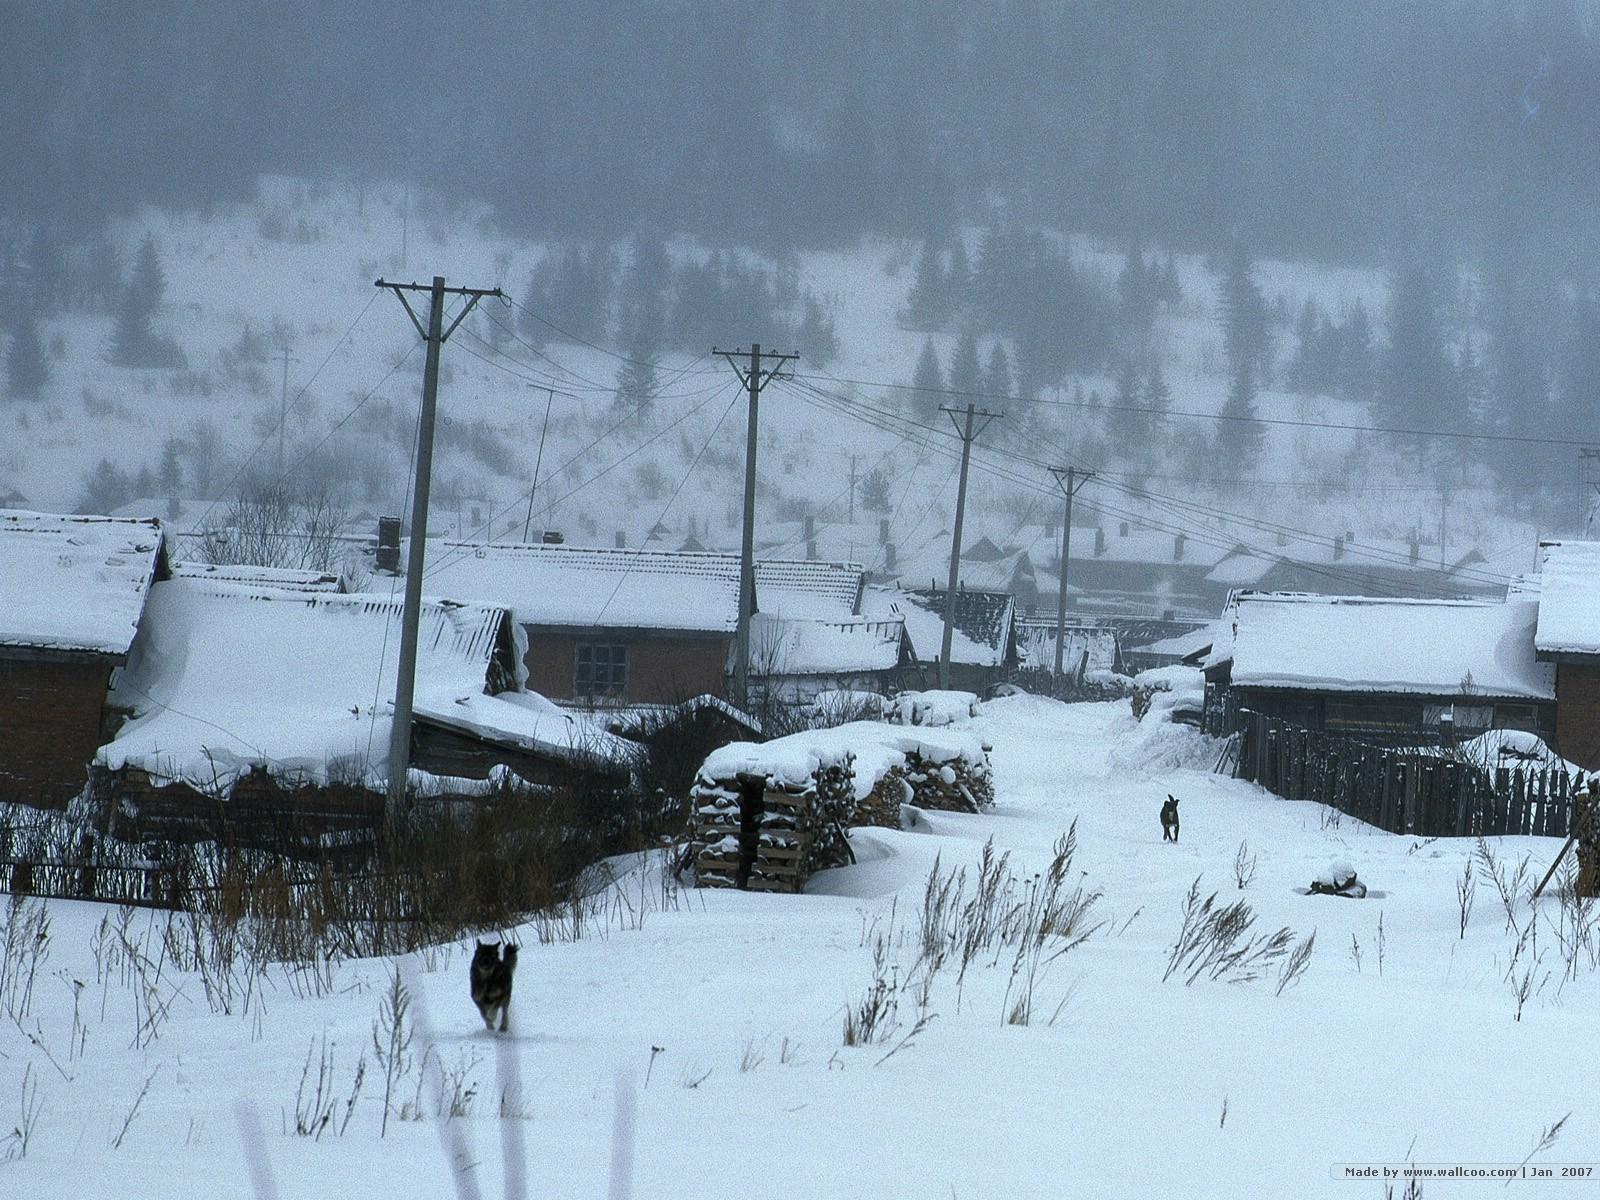 1200冬天下雪的小村图片 desktop wallpaper Snowing Village壁纸,冬